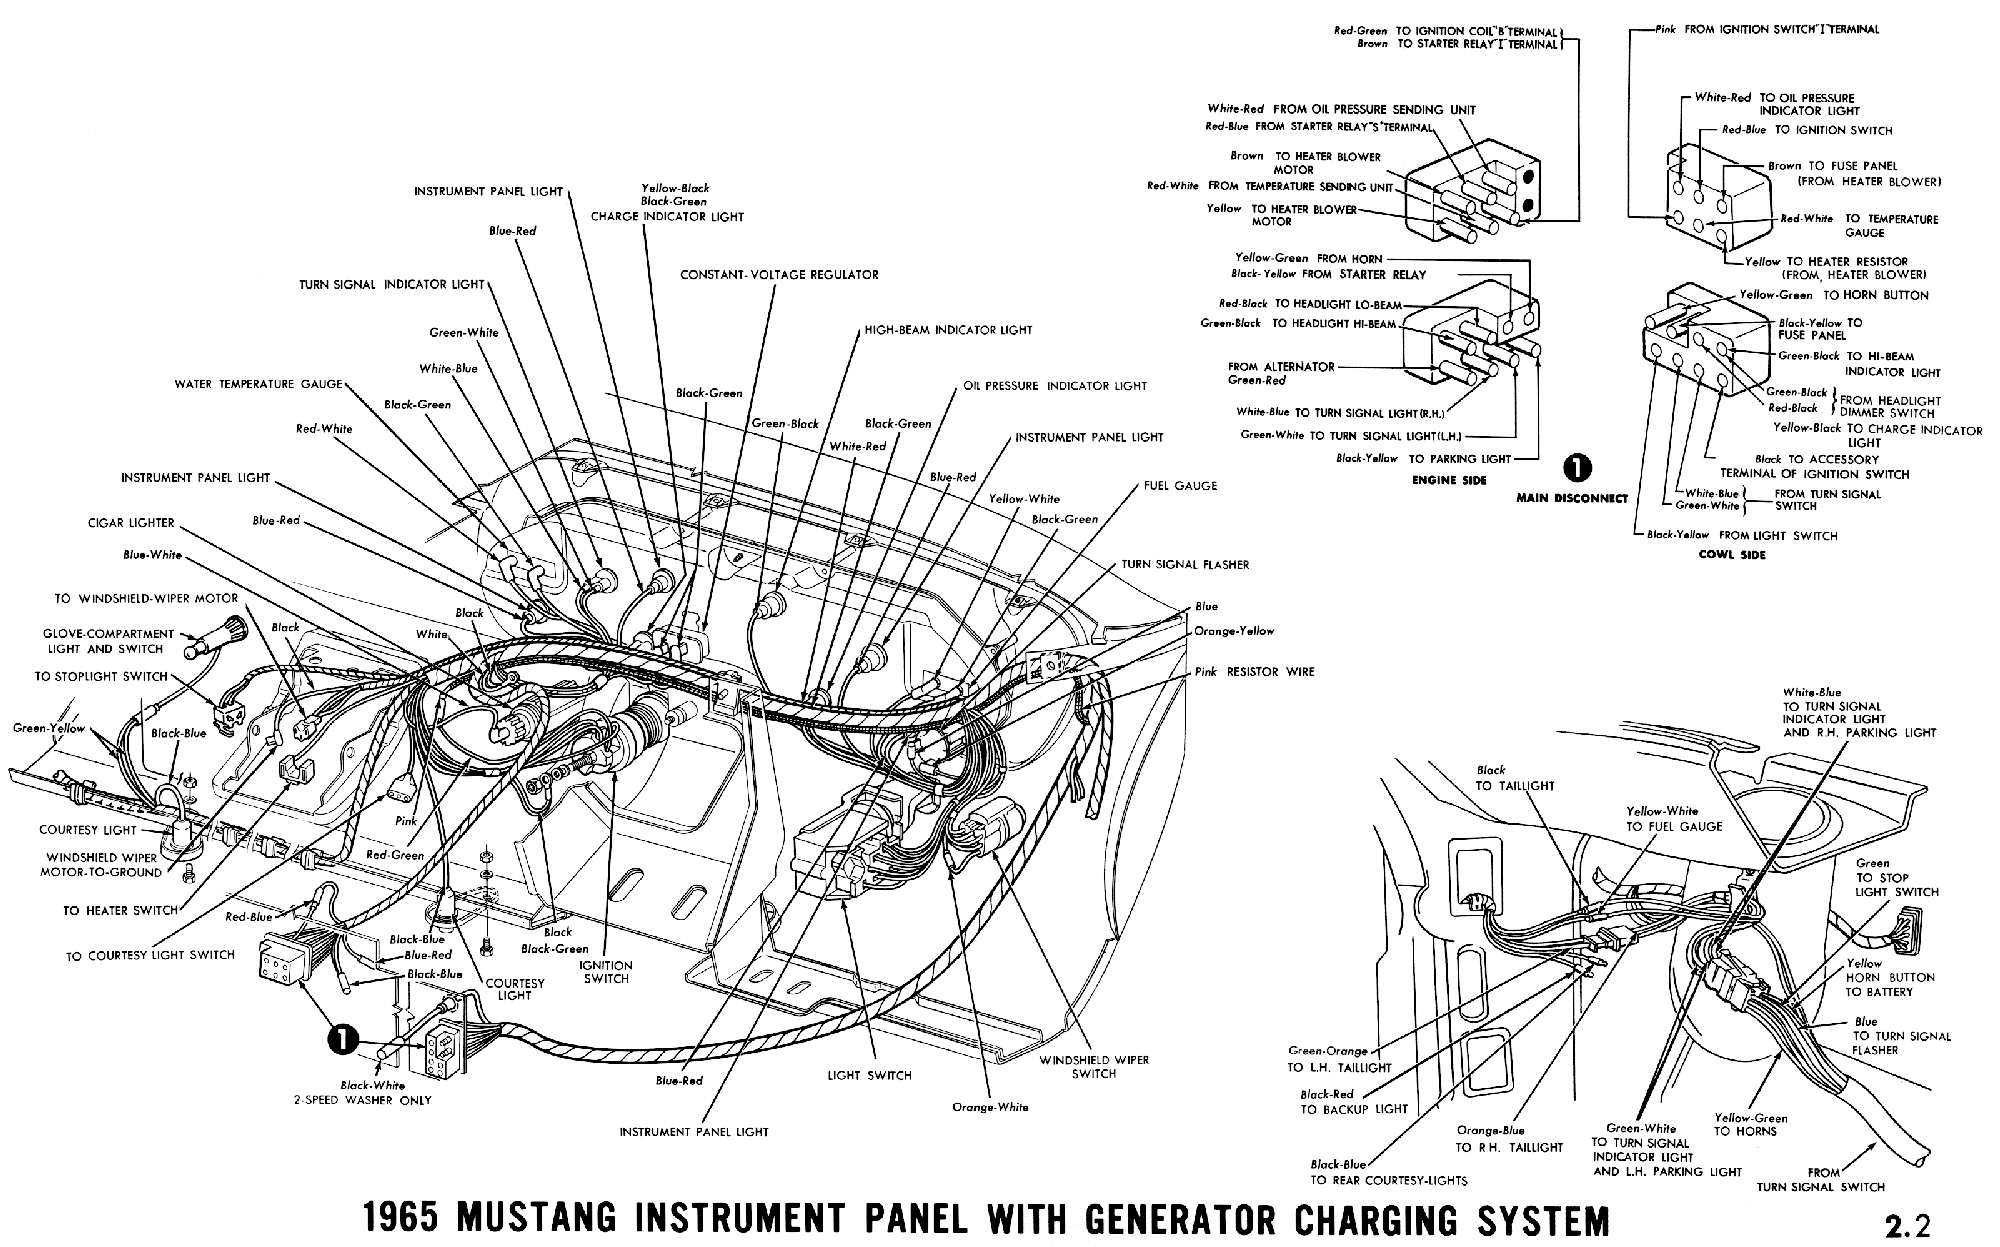 Mustang Wiring Harness Diagram - Wiring Diagrams Hubs - Mustang Wiring Harness Diagram